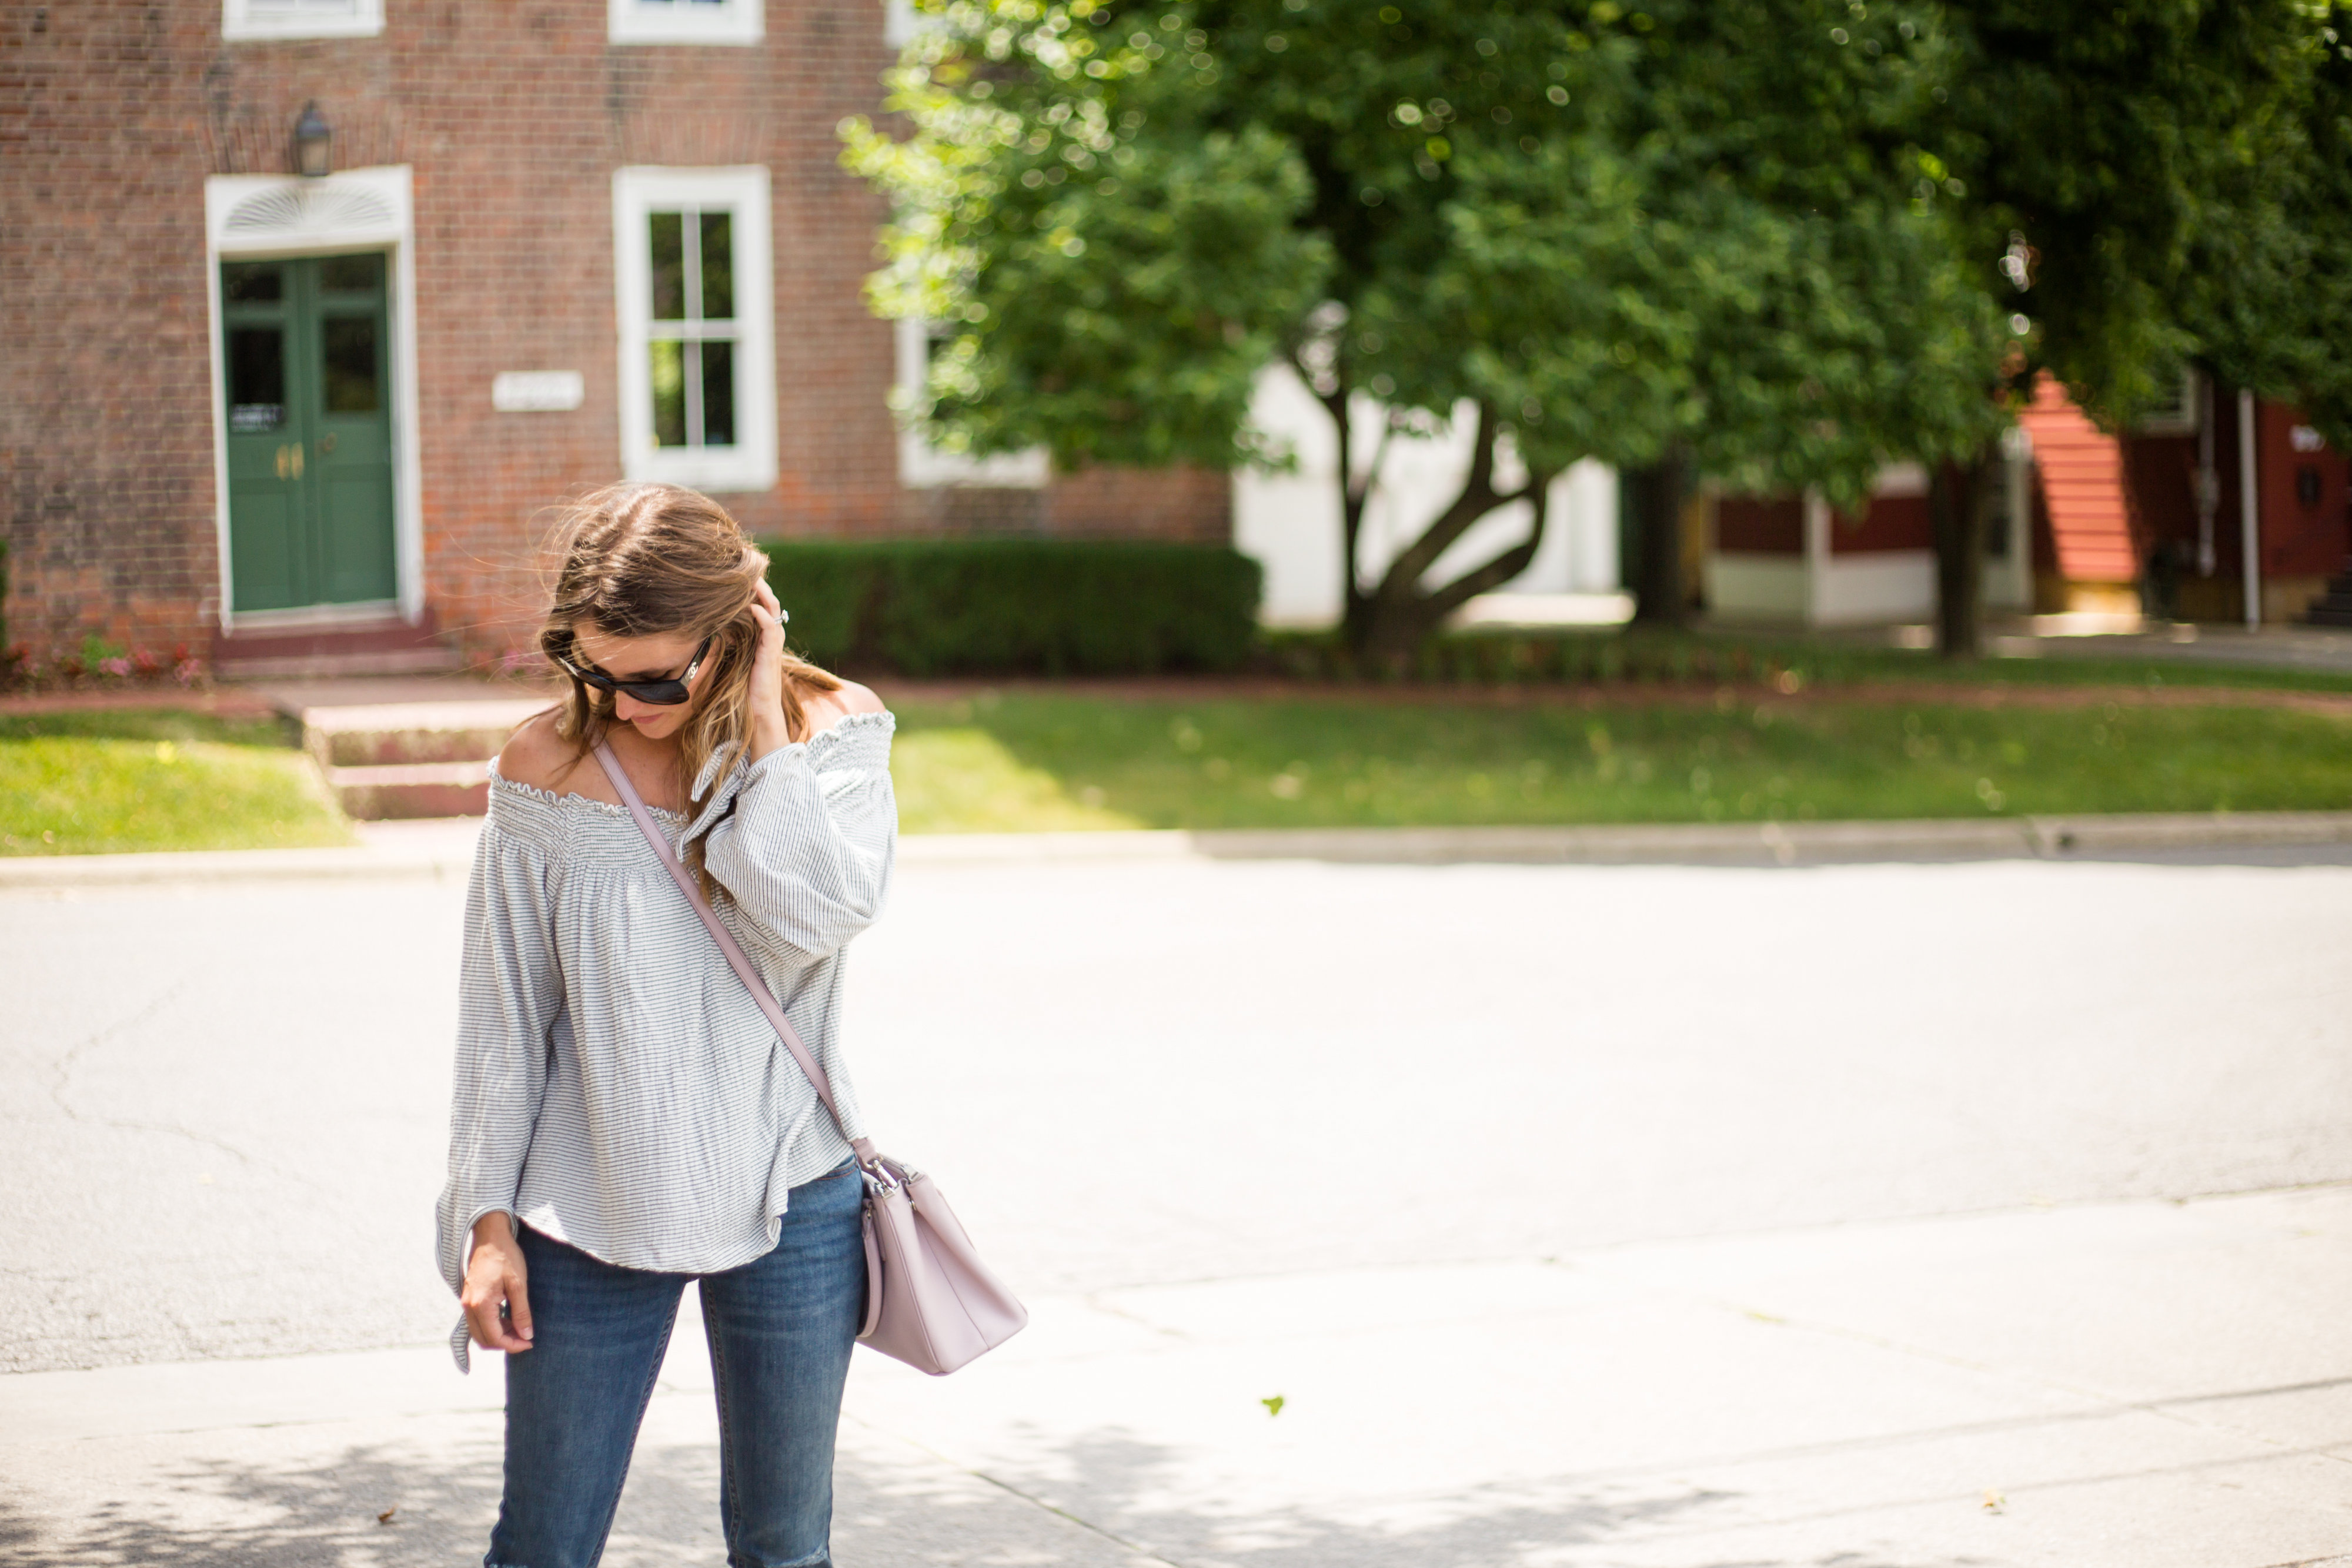 blush prada bag fall outfit inspo off the shoulder top